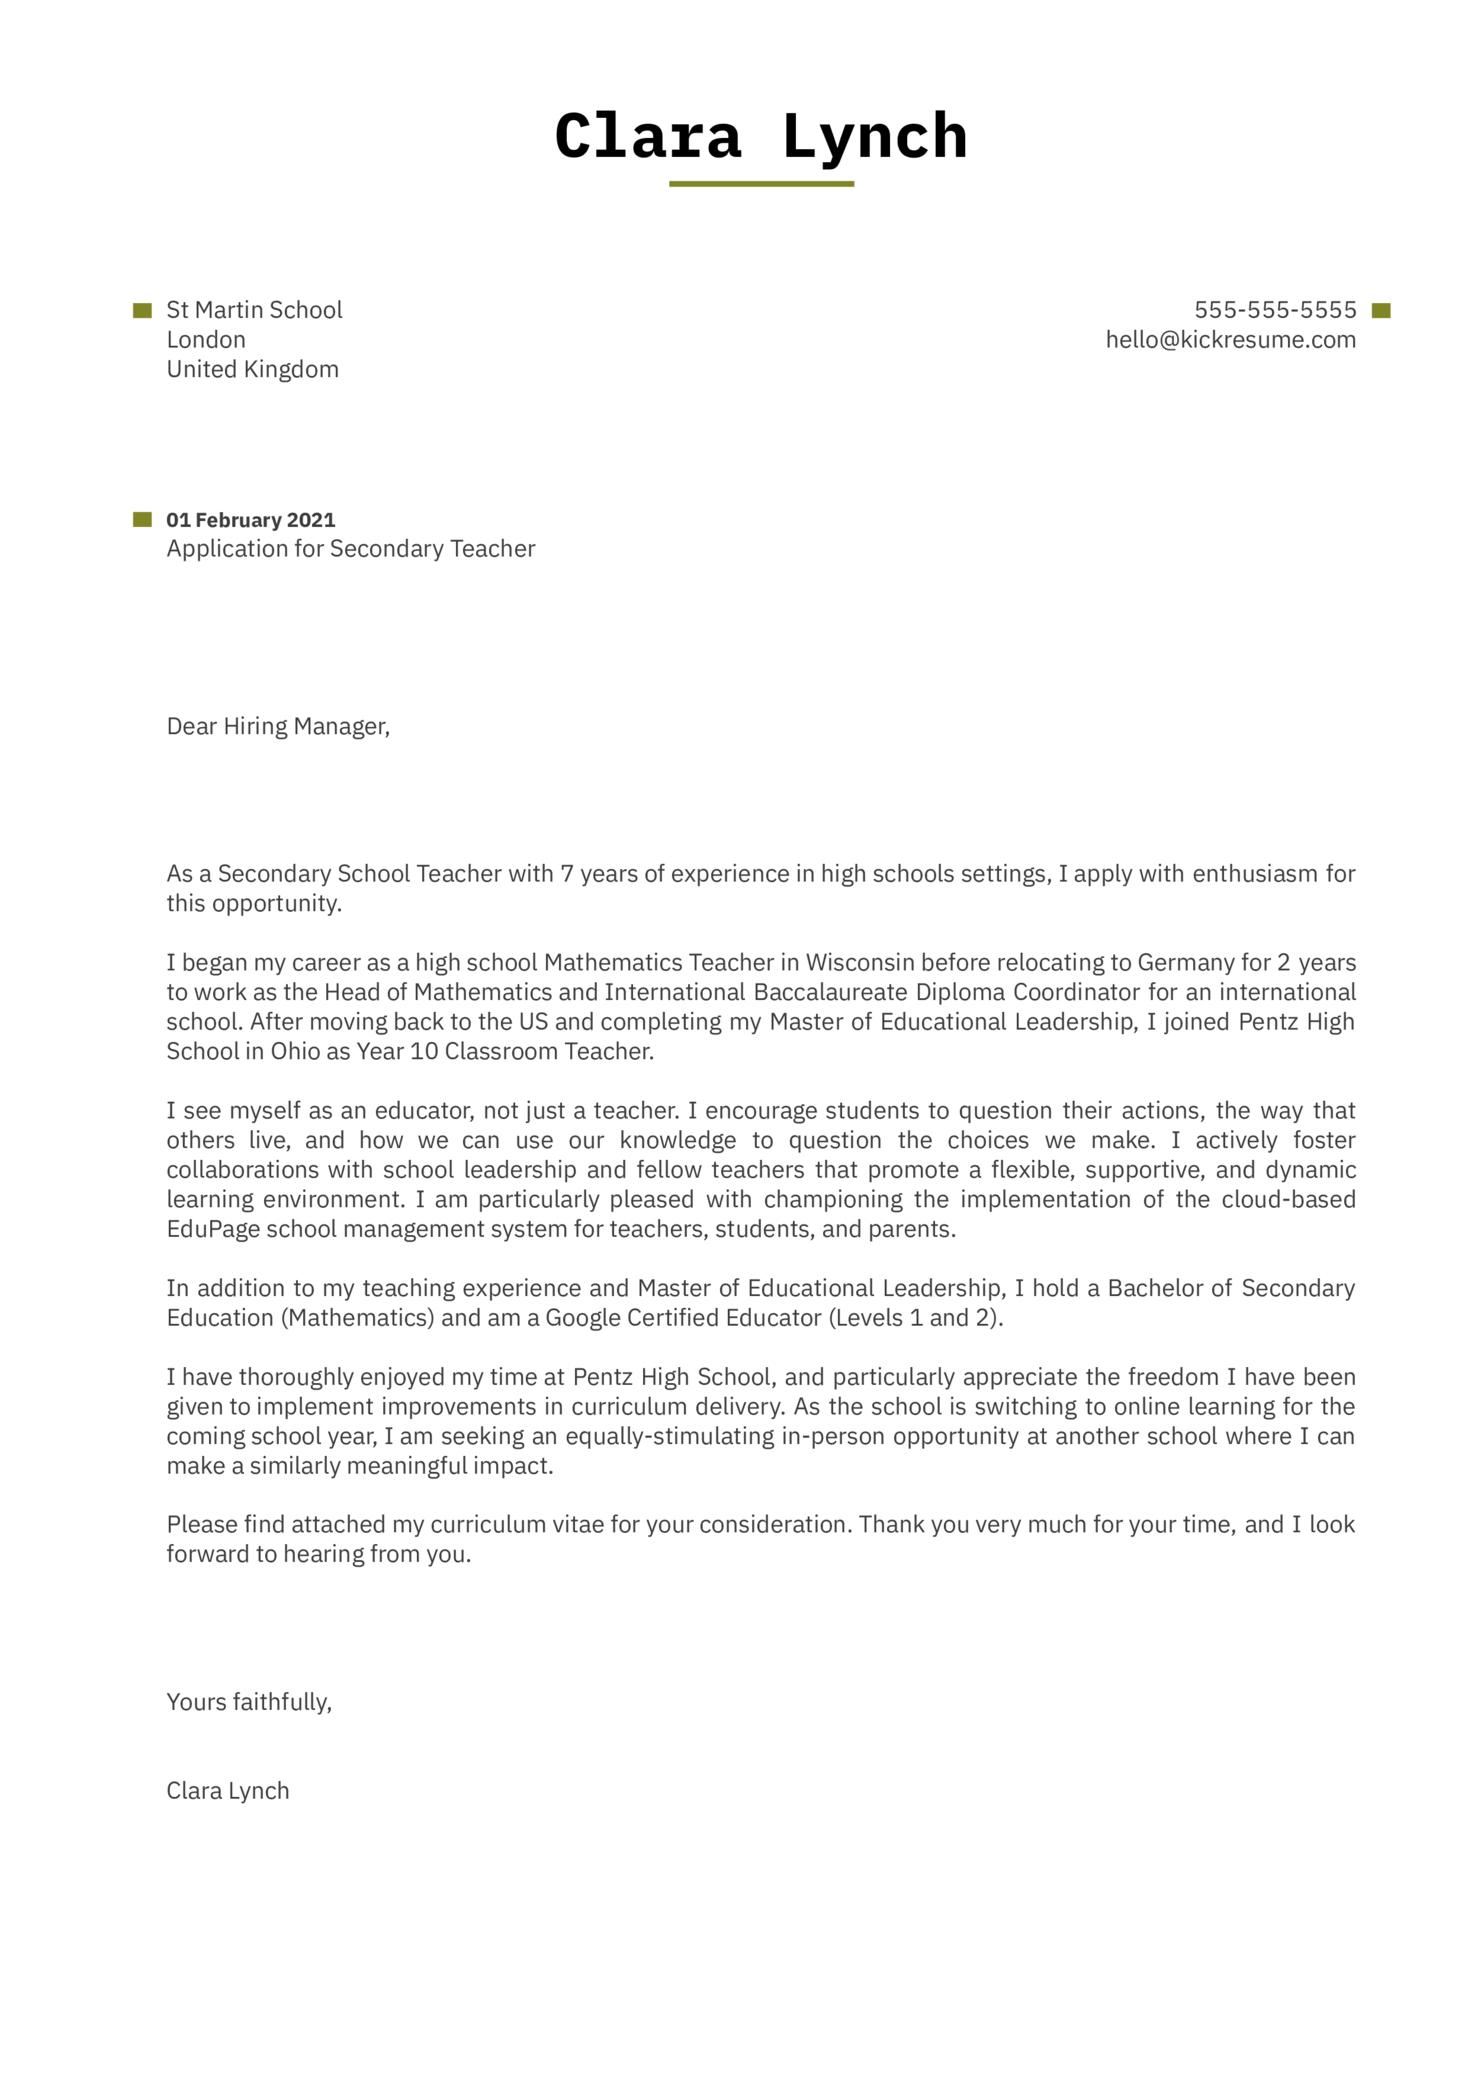 Secondary Teacher Cover Letter Template